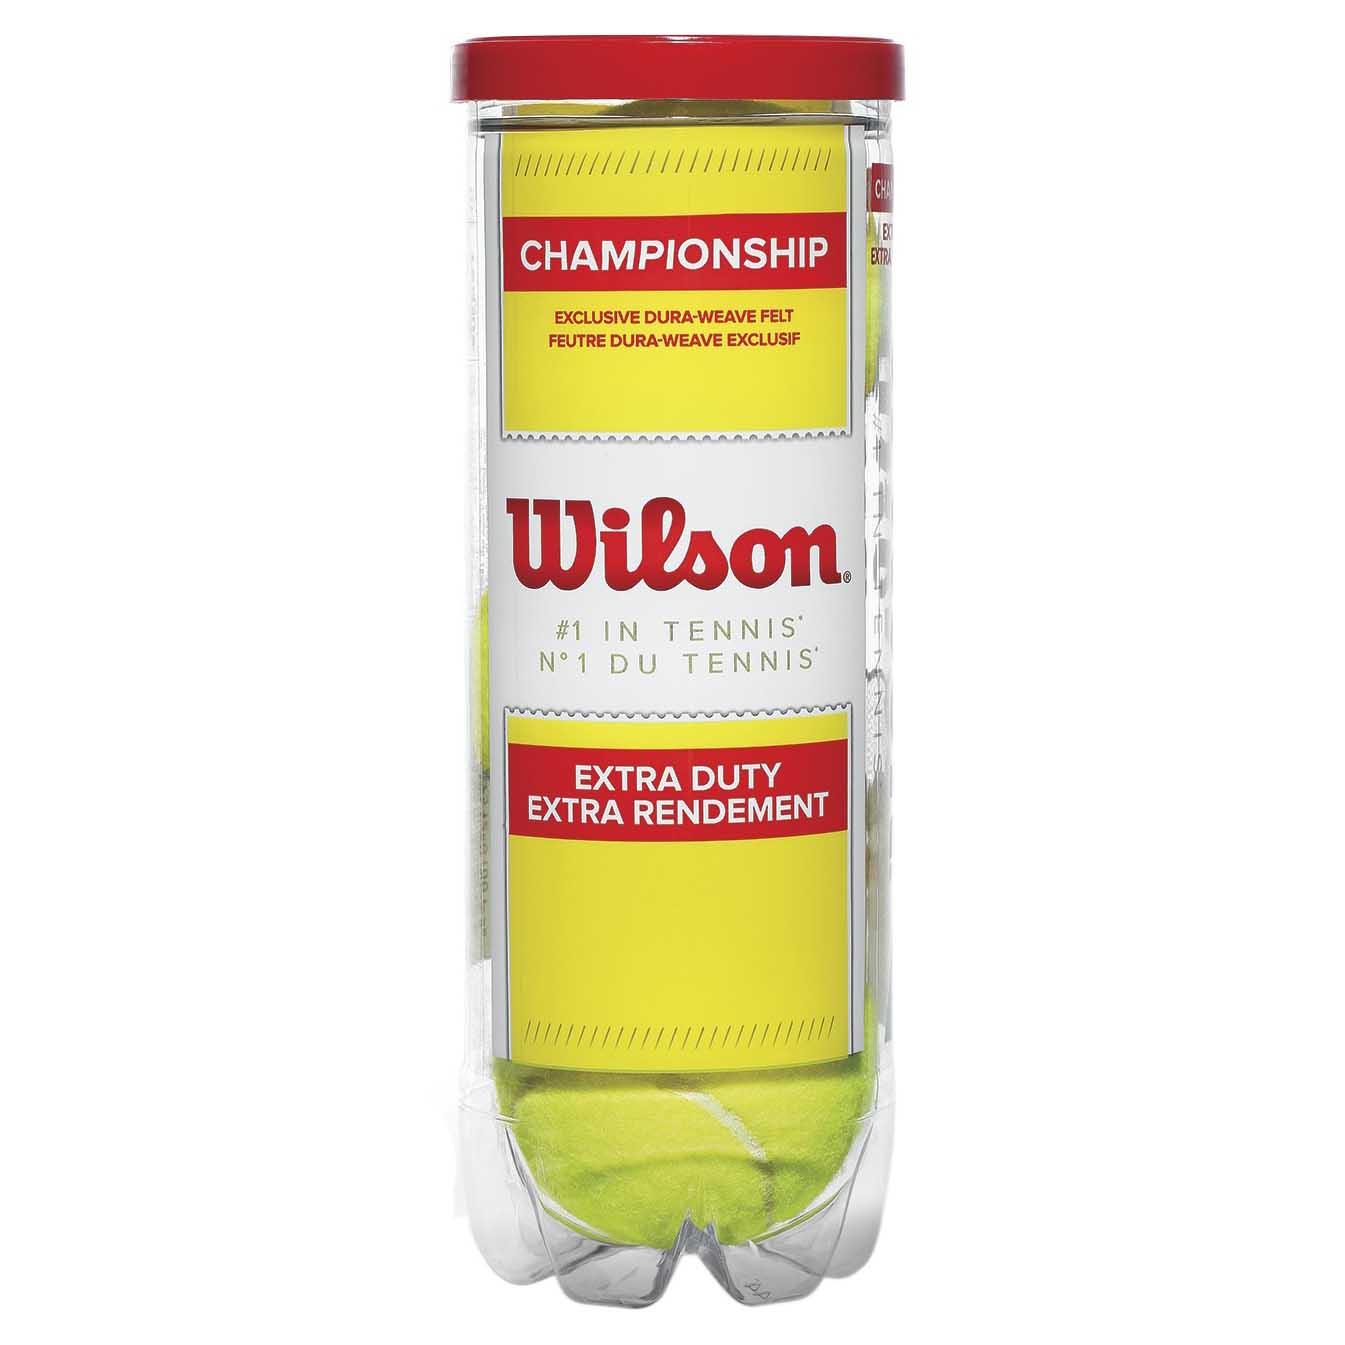 Wilson Champion Xd 3 Balls Yellow